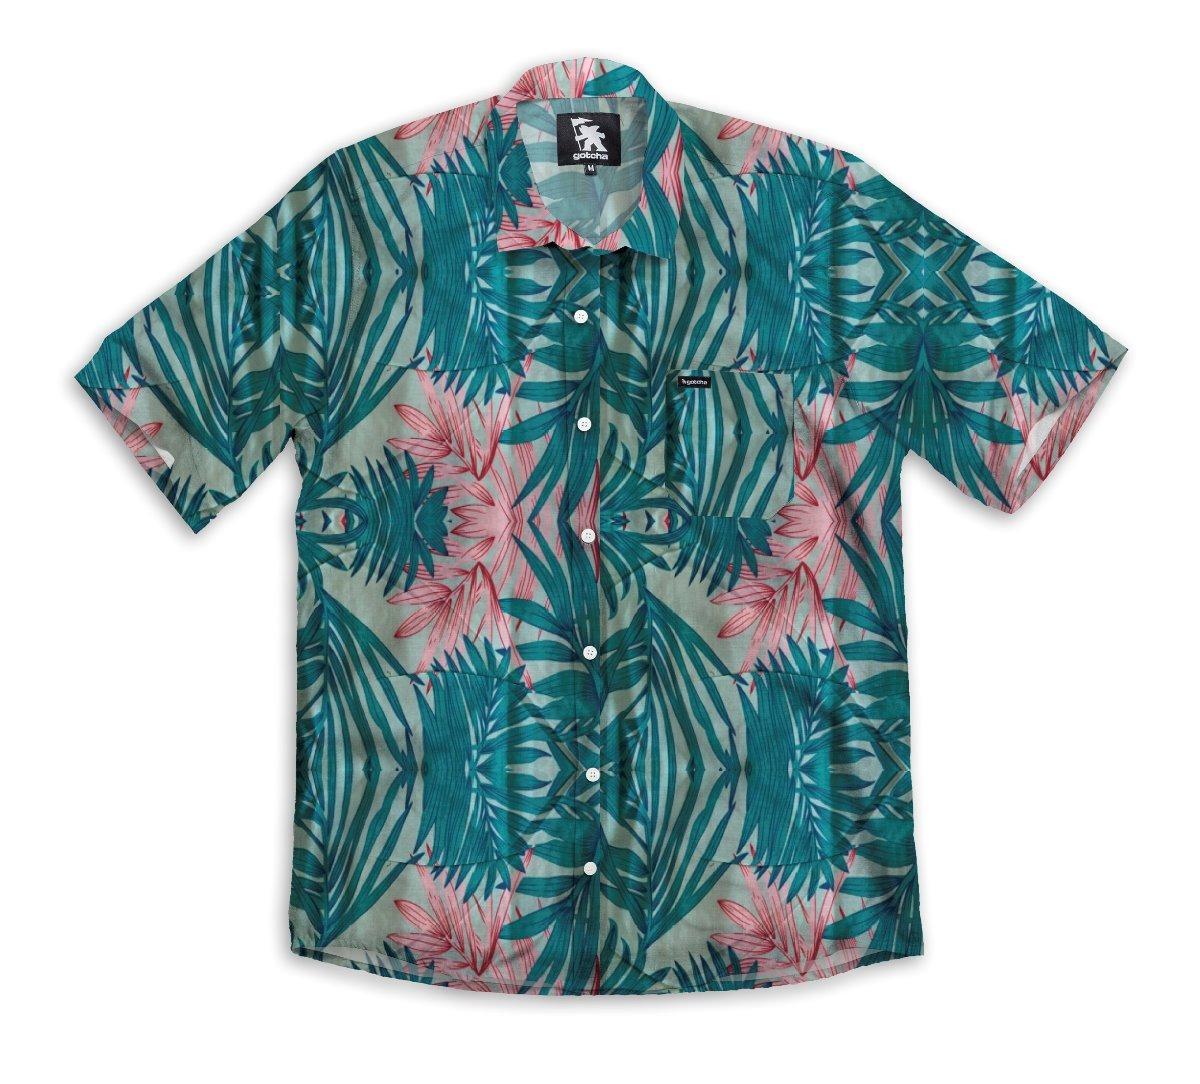 Hawaiana Manga Skate Camisa Gotcha Suft Corta Hombre thsQdCxr